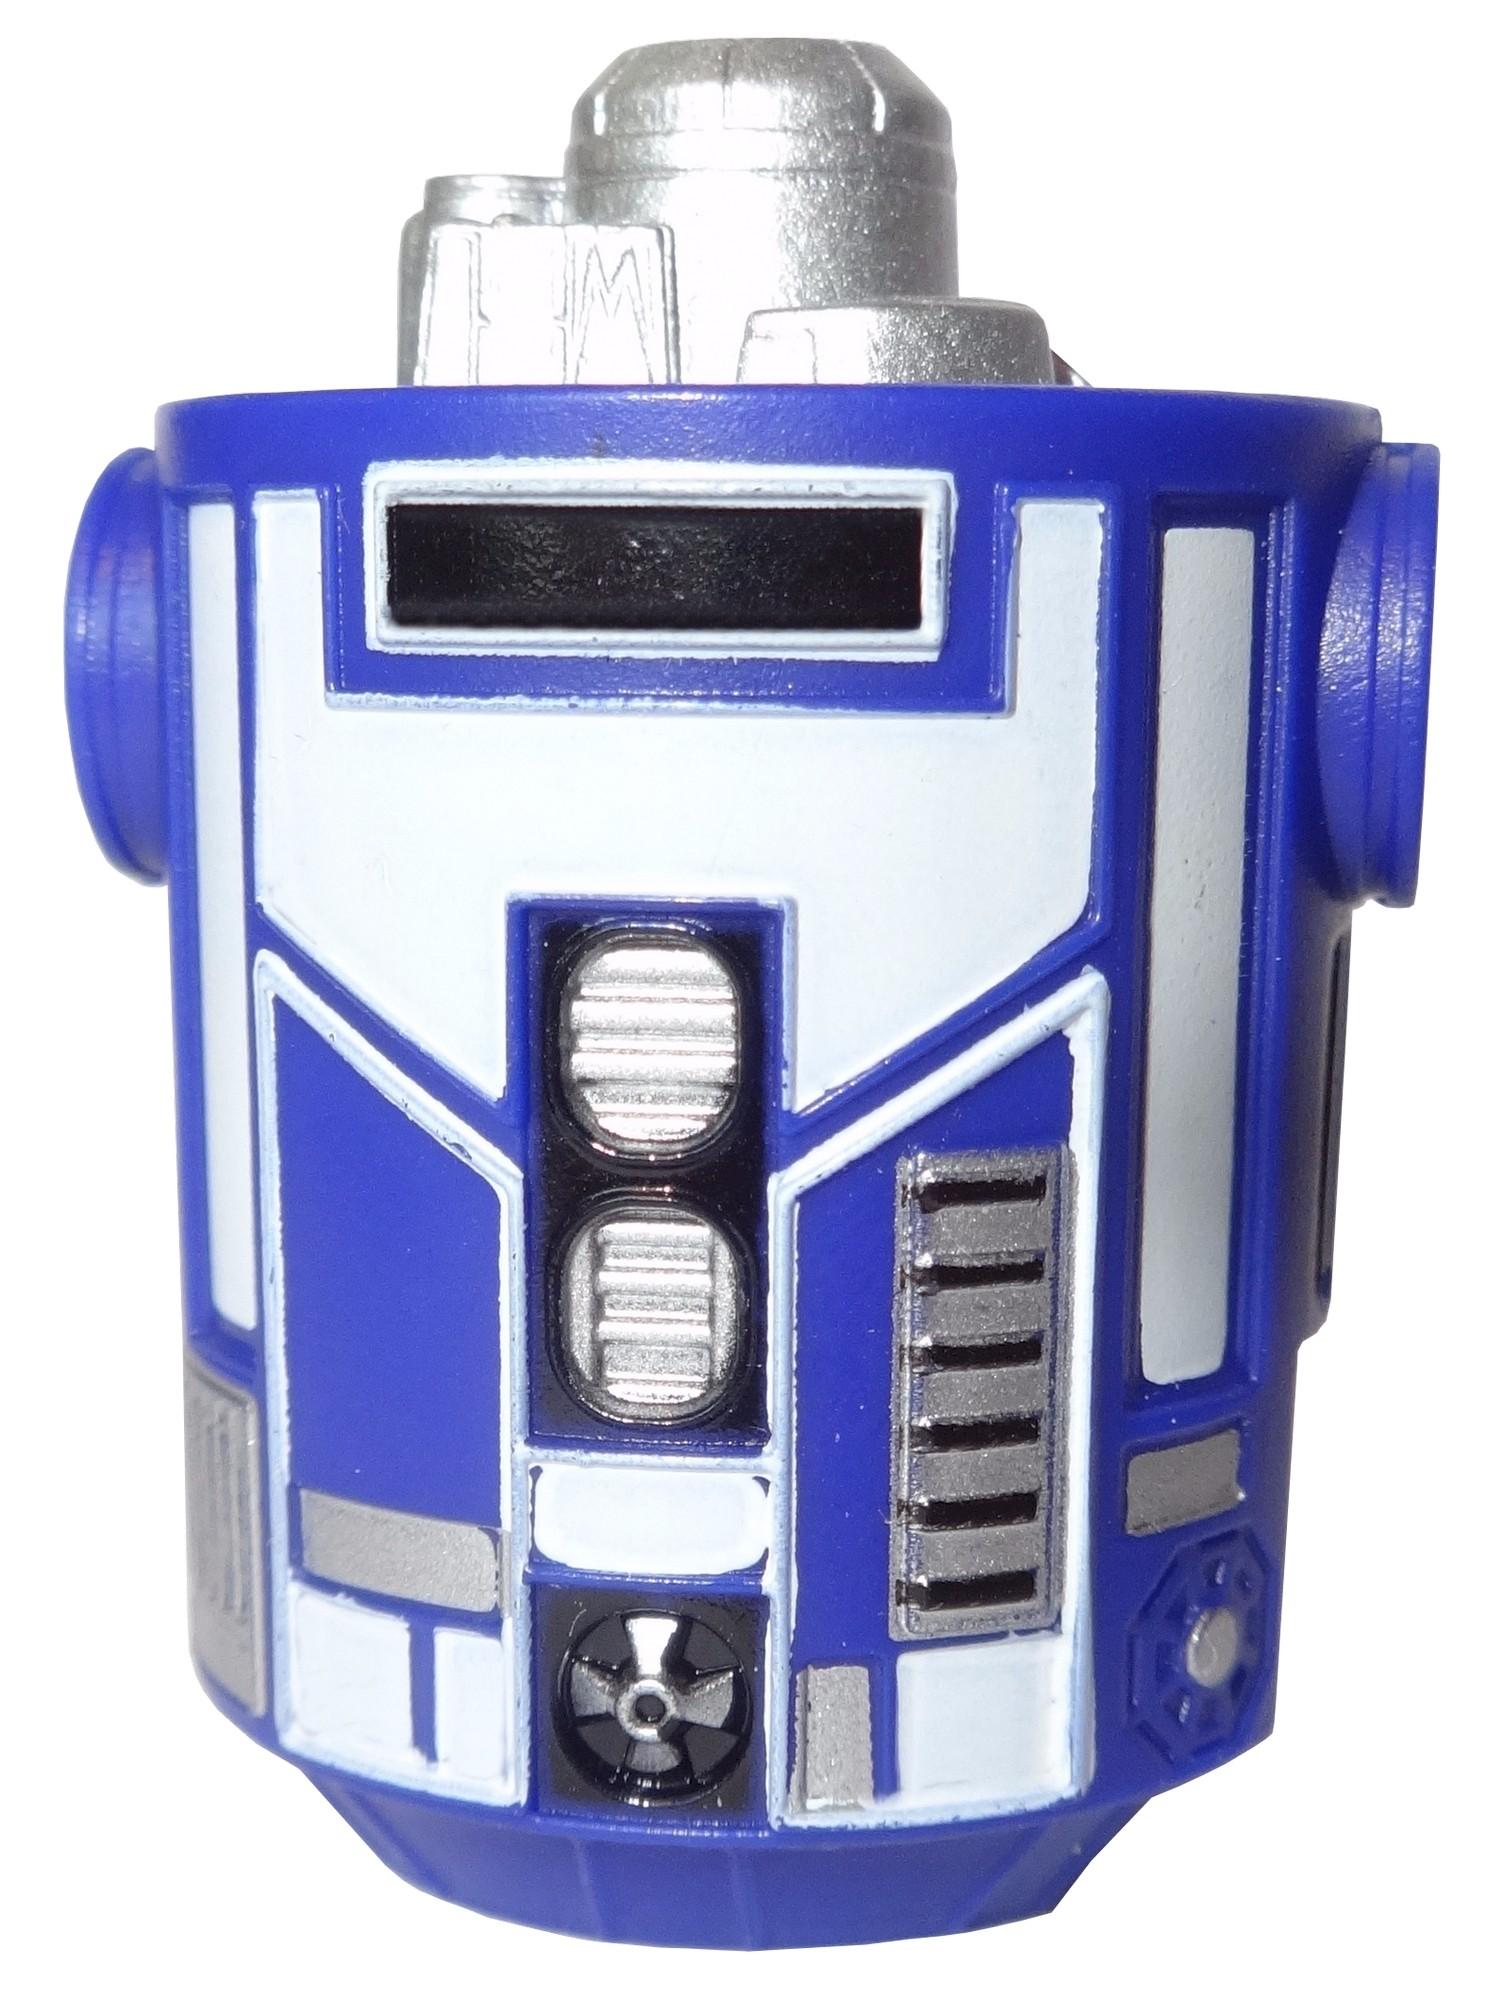 Blue Astromech Droid Body ~ Series 2 from Disney Star Wars Build-A-Droid Factory © Dizdude.com